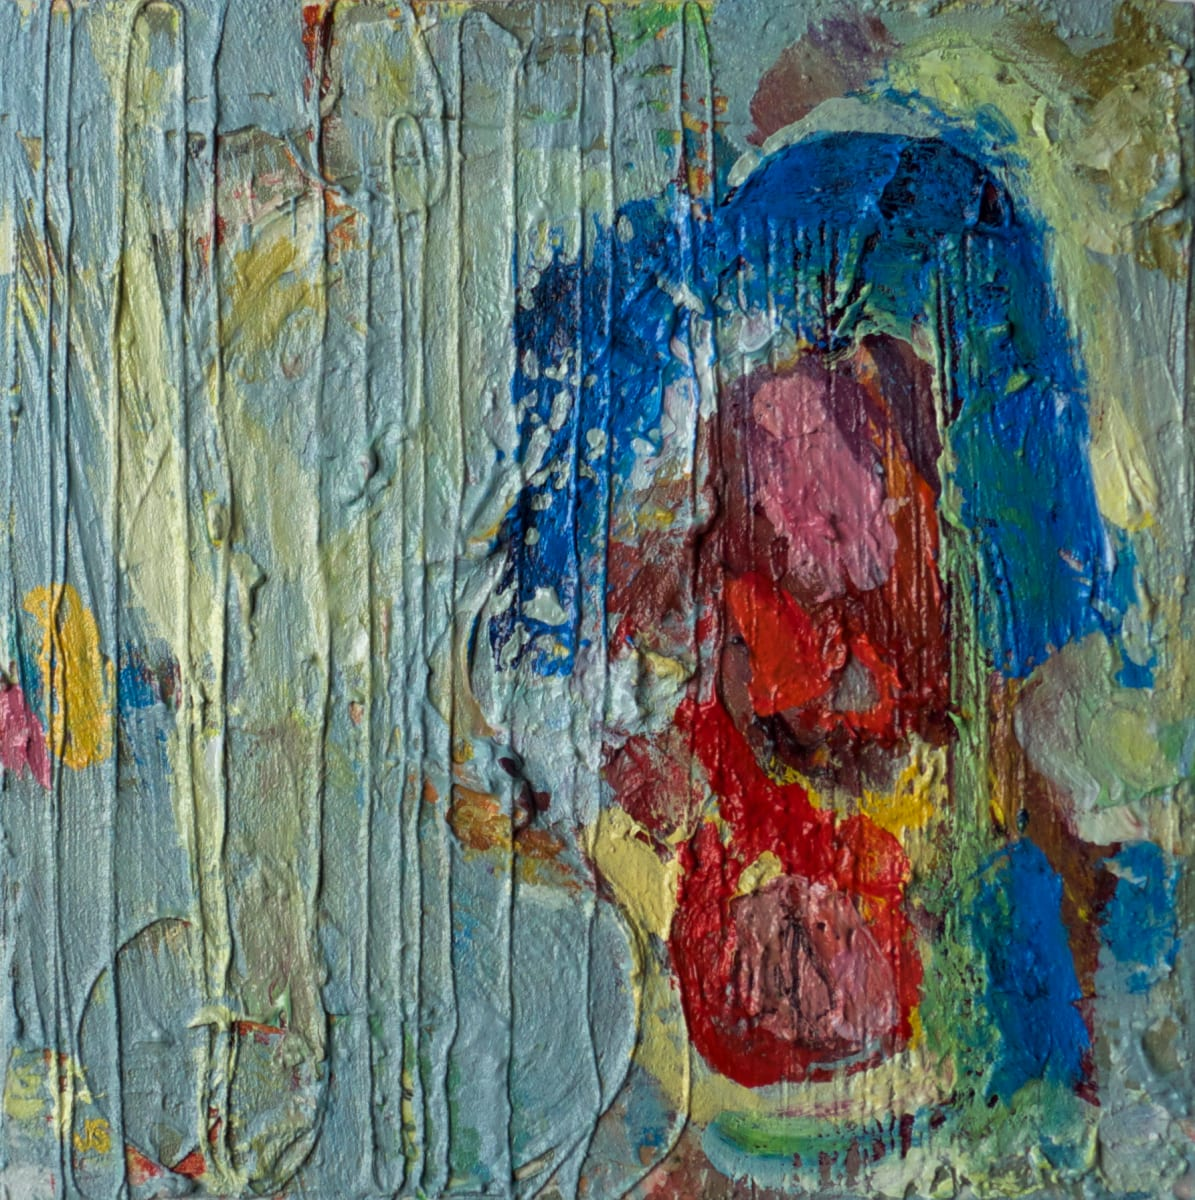 Untitled Blue by Jessica Singerman